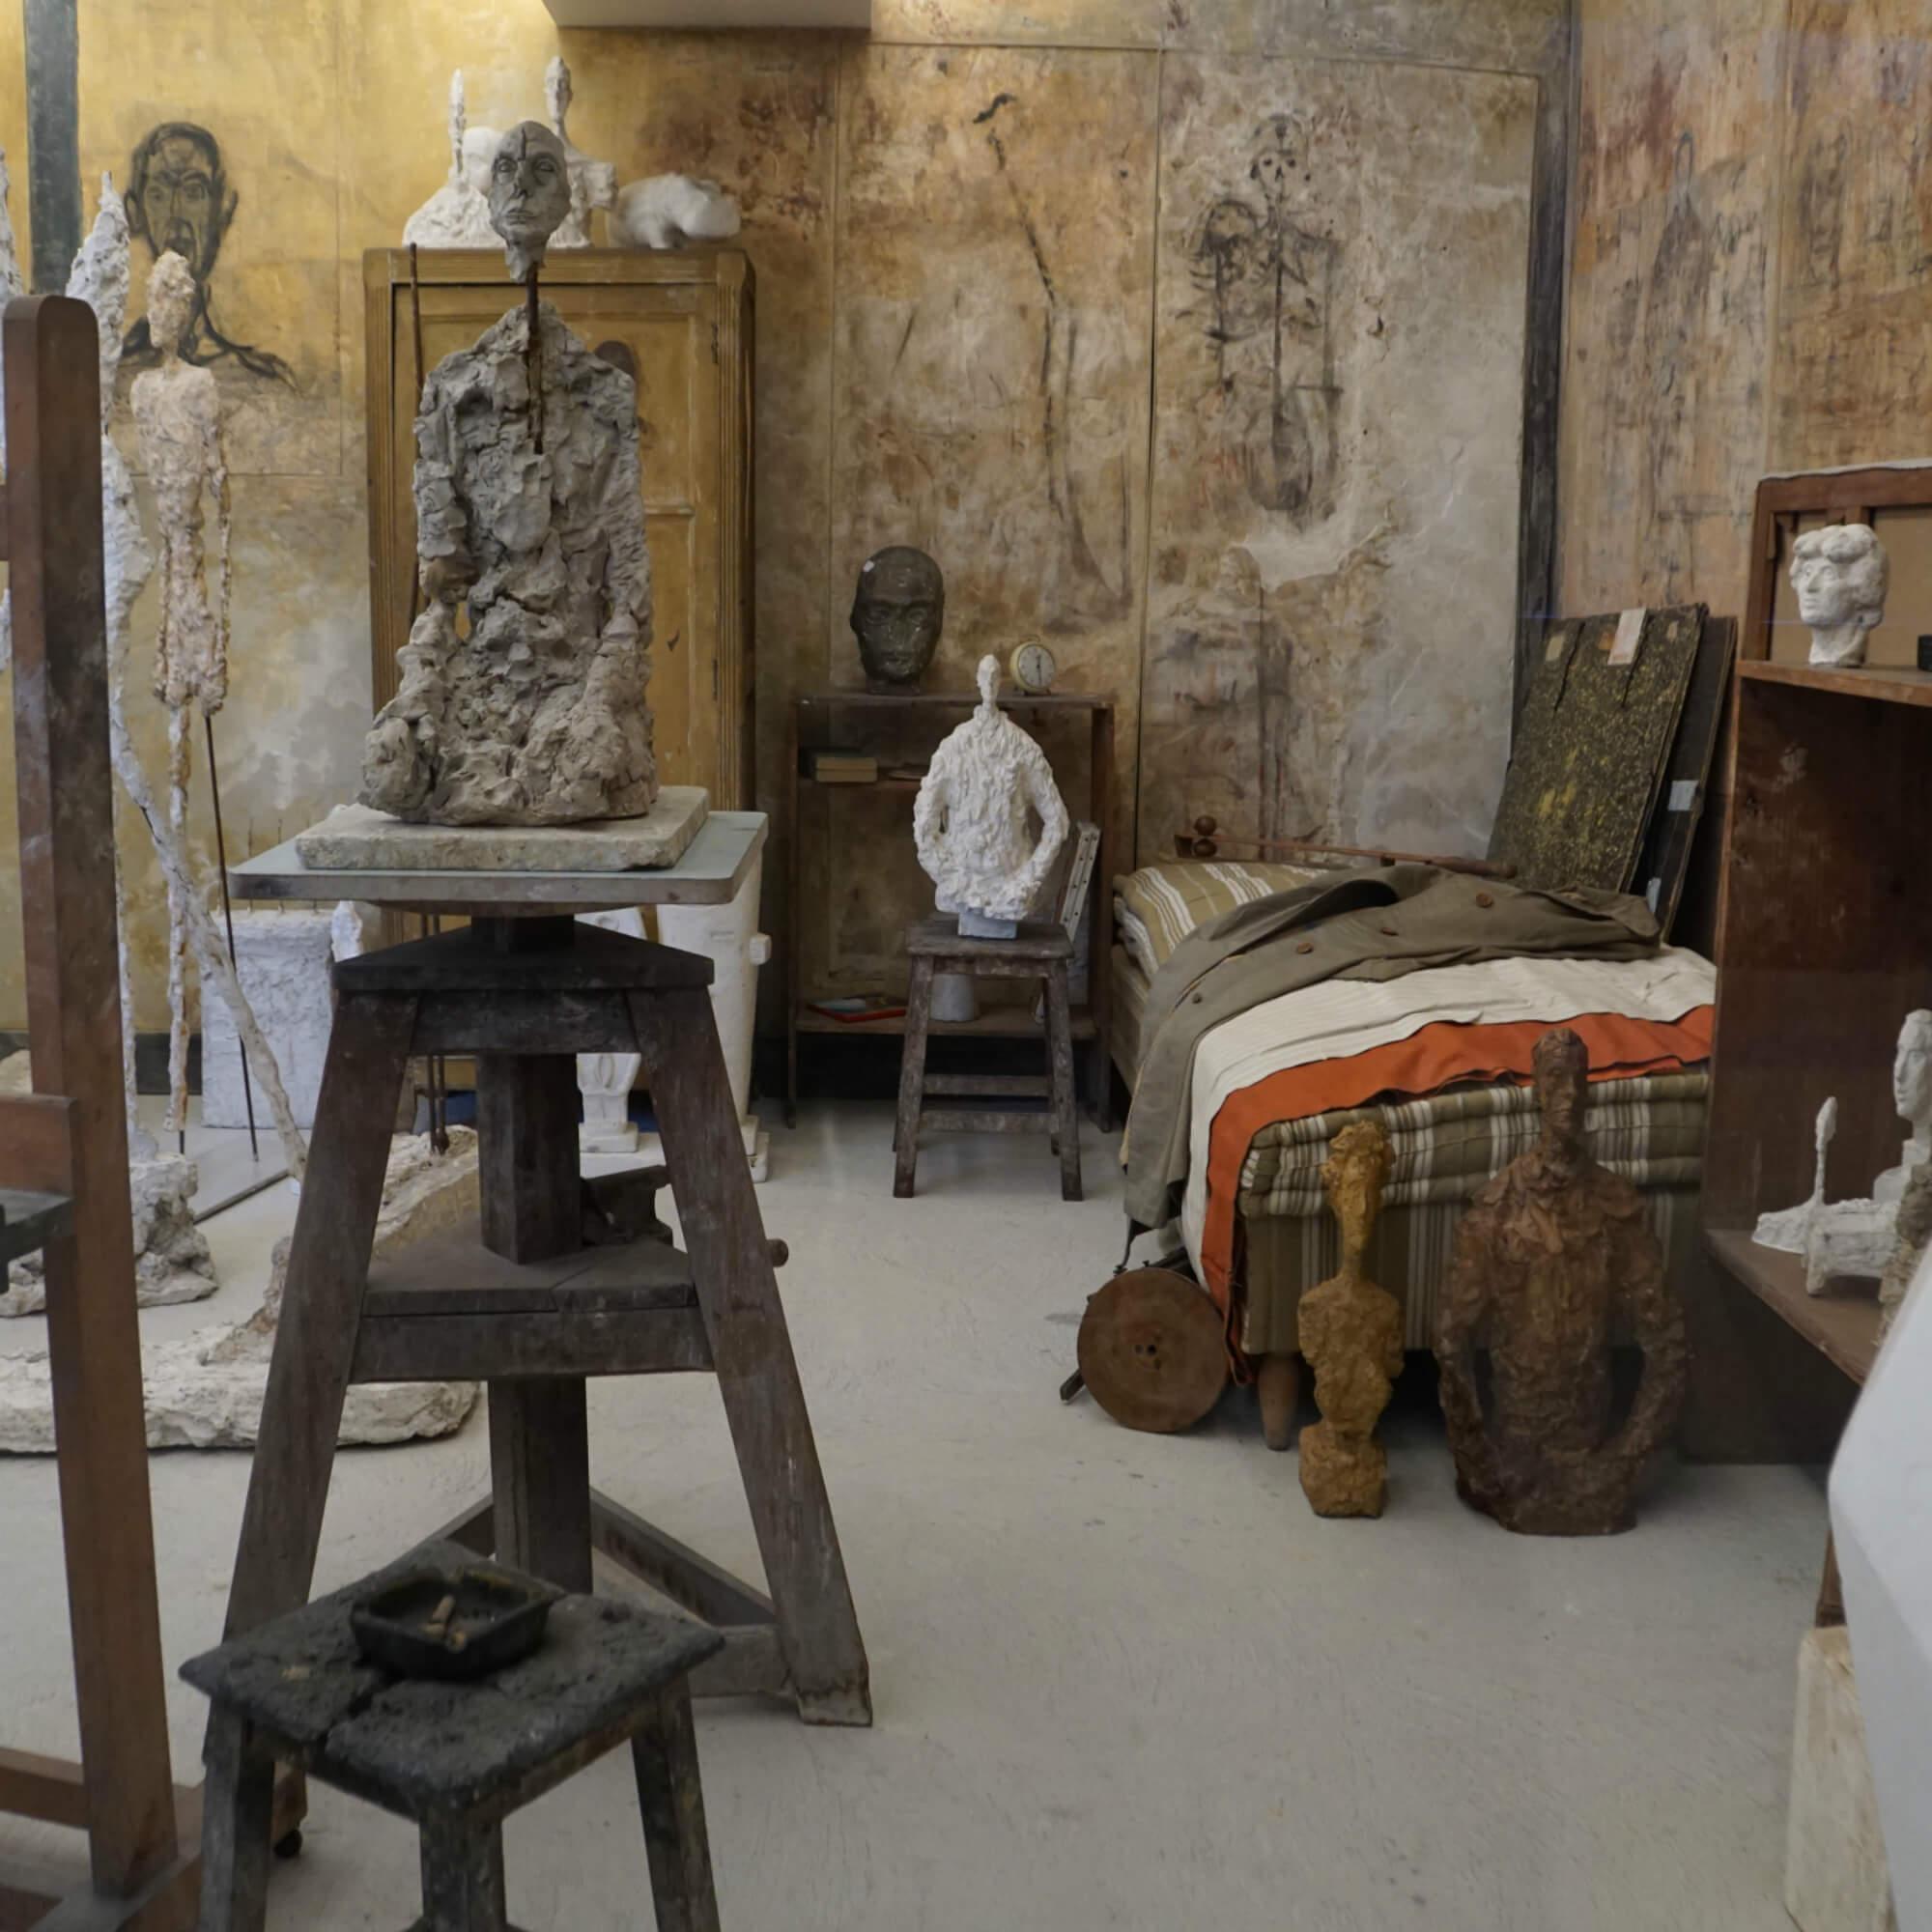 Ü60 Bloggerin Ursel vom IKNMLO Fashionblog über Atelier Giacometti